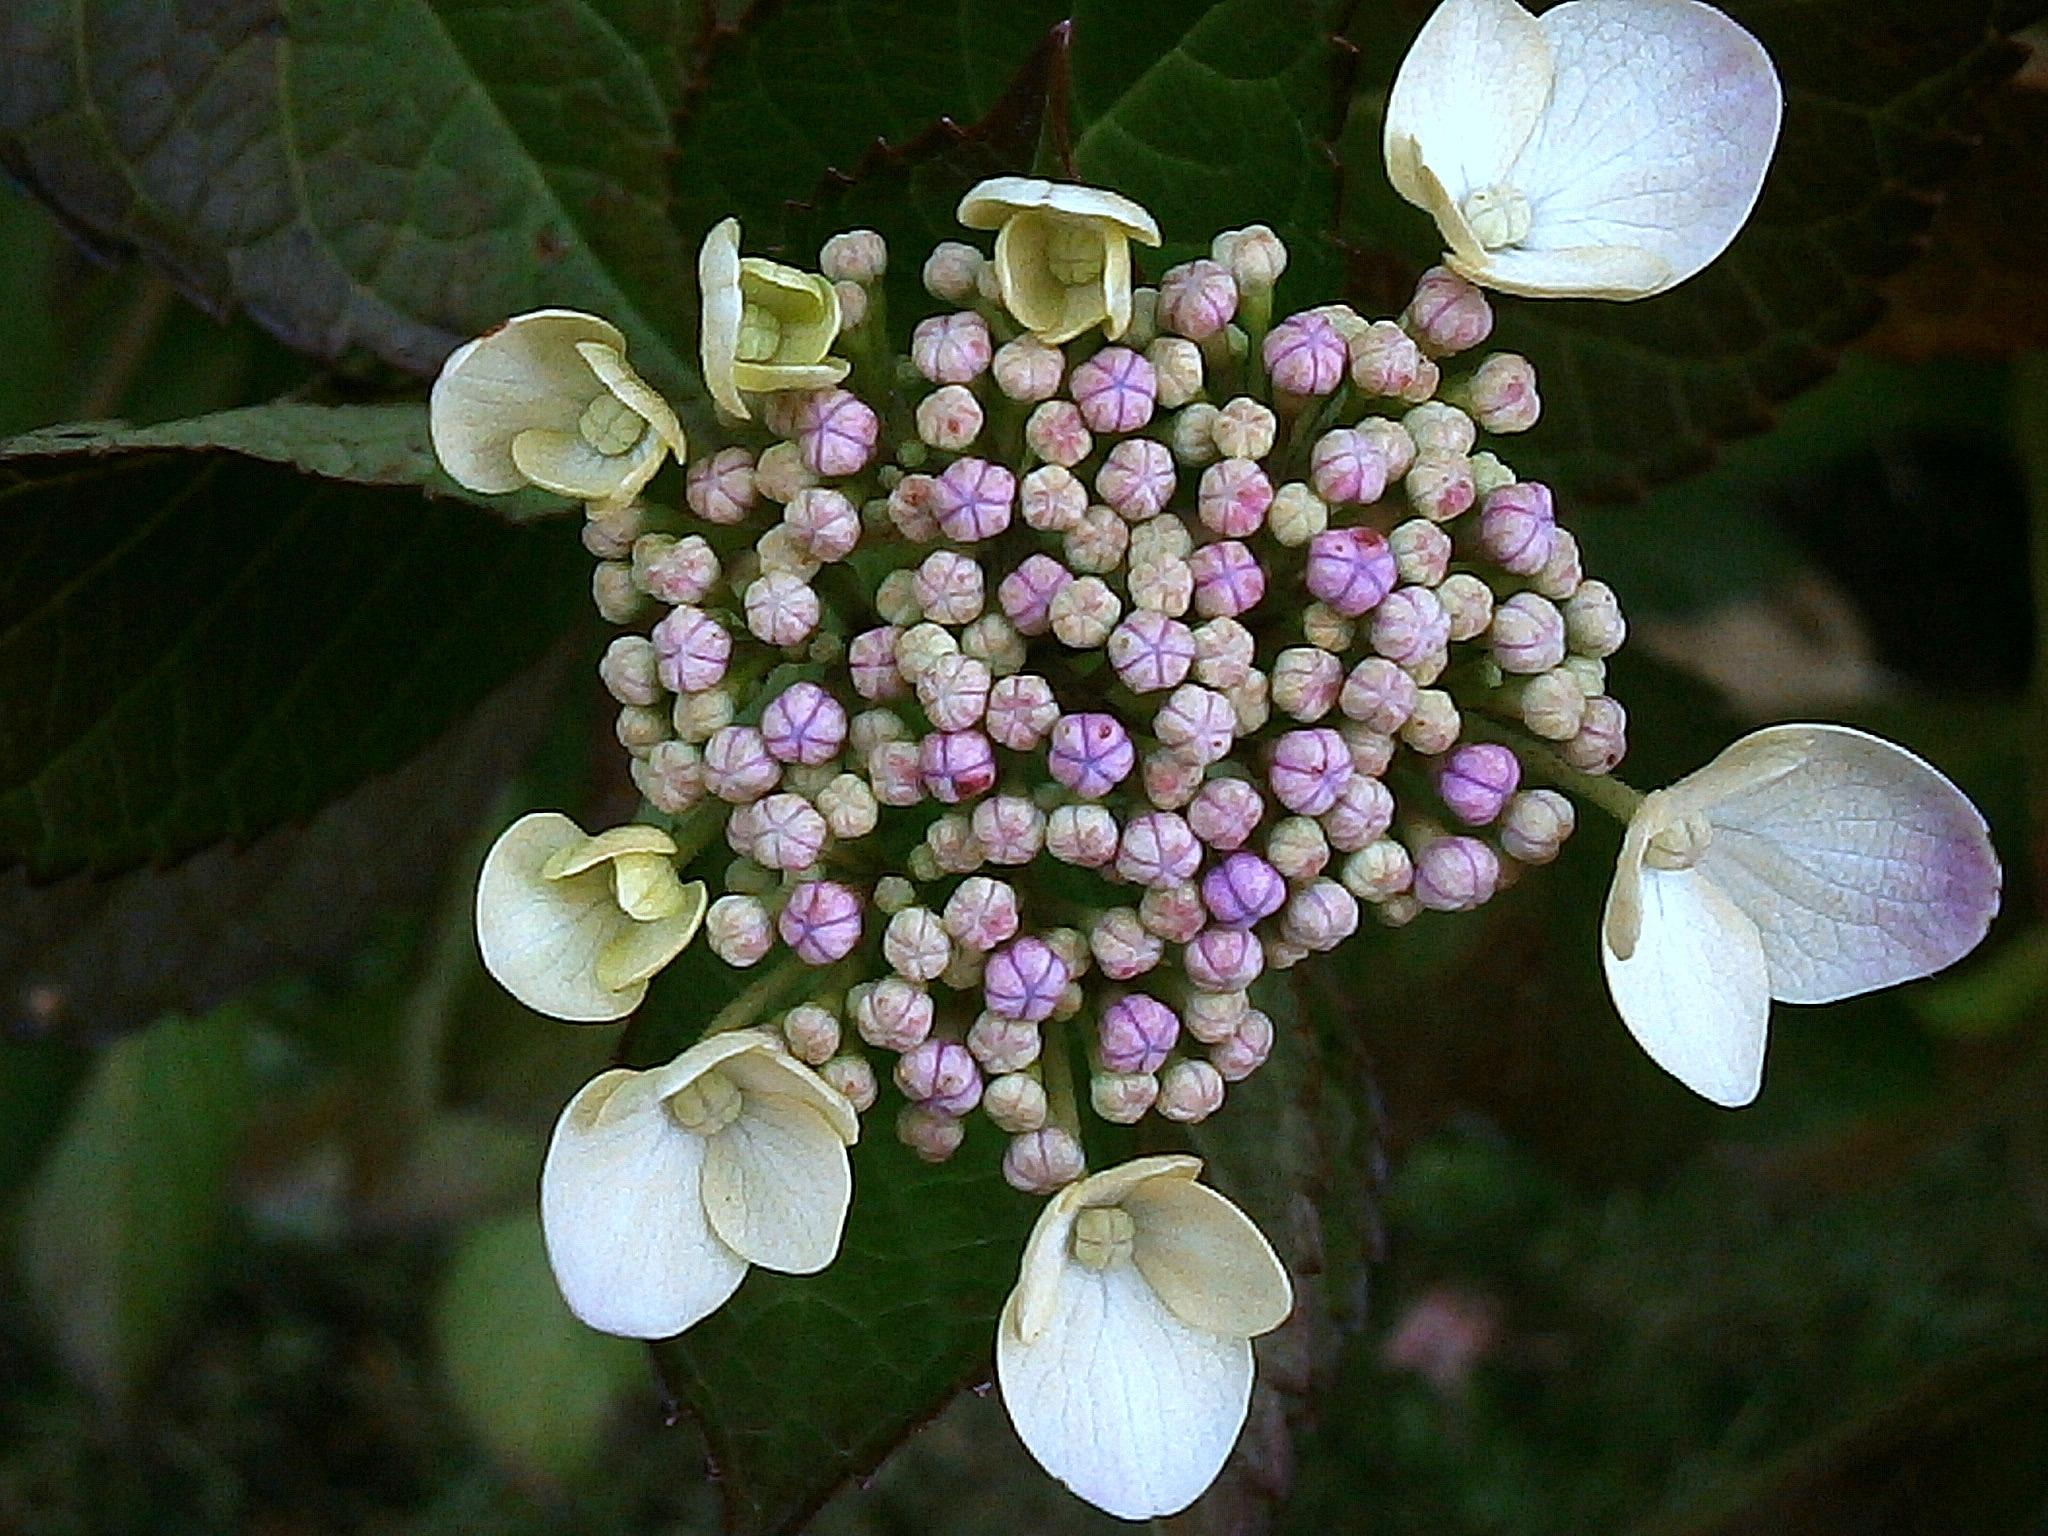 Free Images Nature Blossom White Flower Purple Petal Bloom